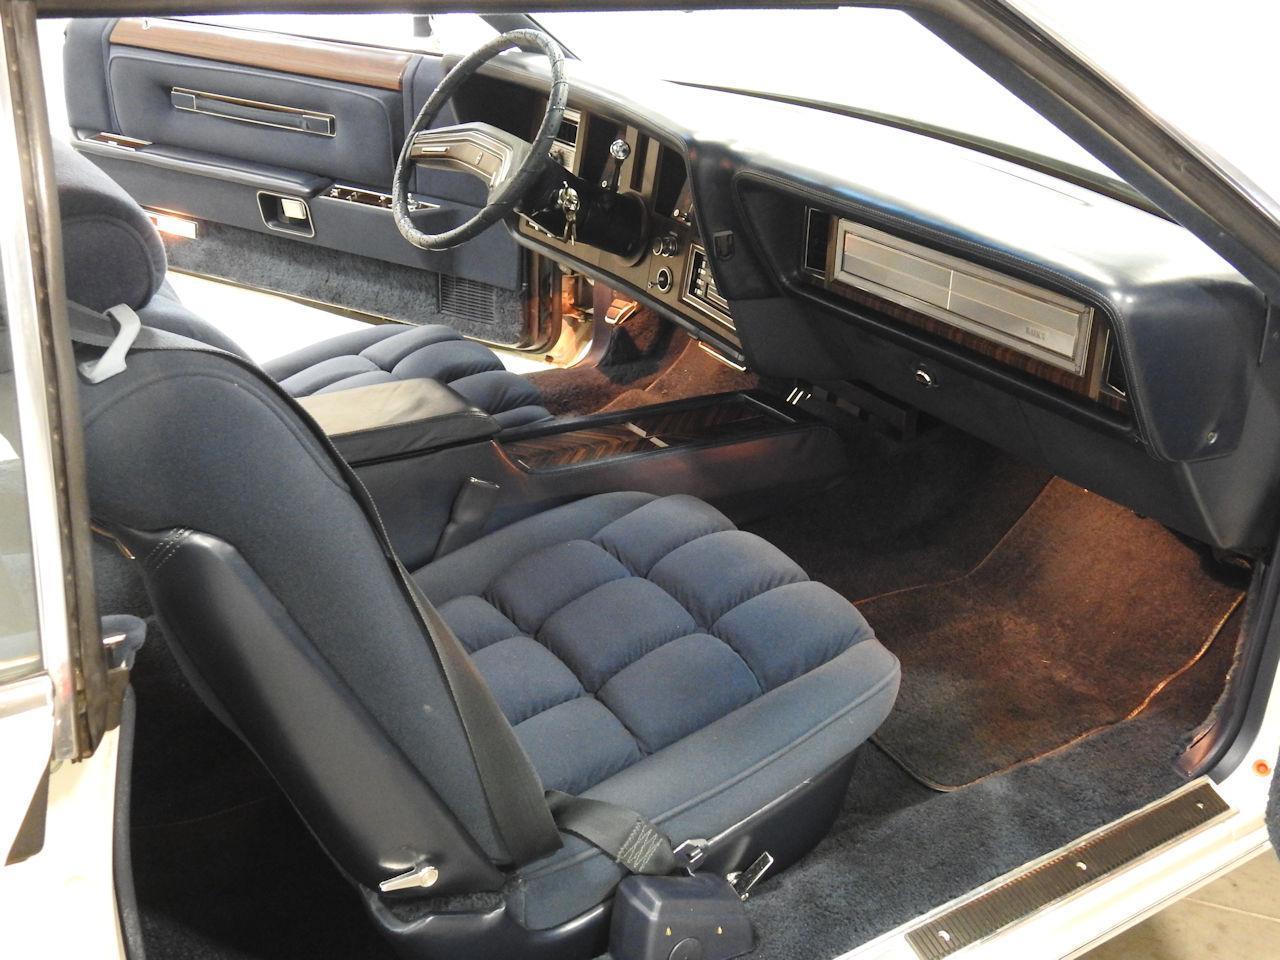 1979 Lincoln MKV 58